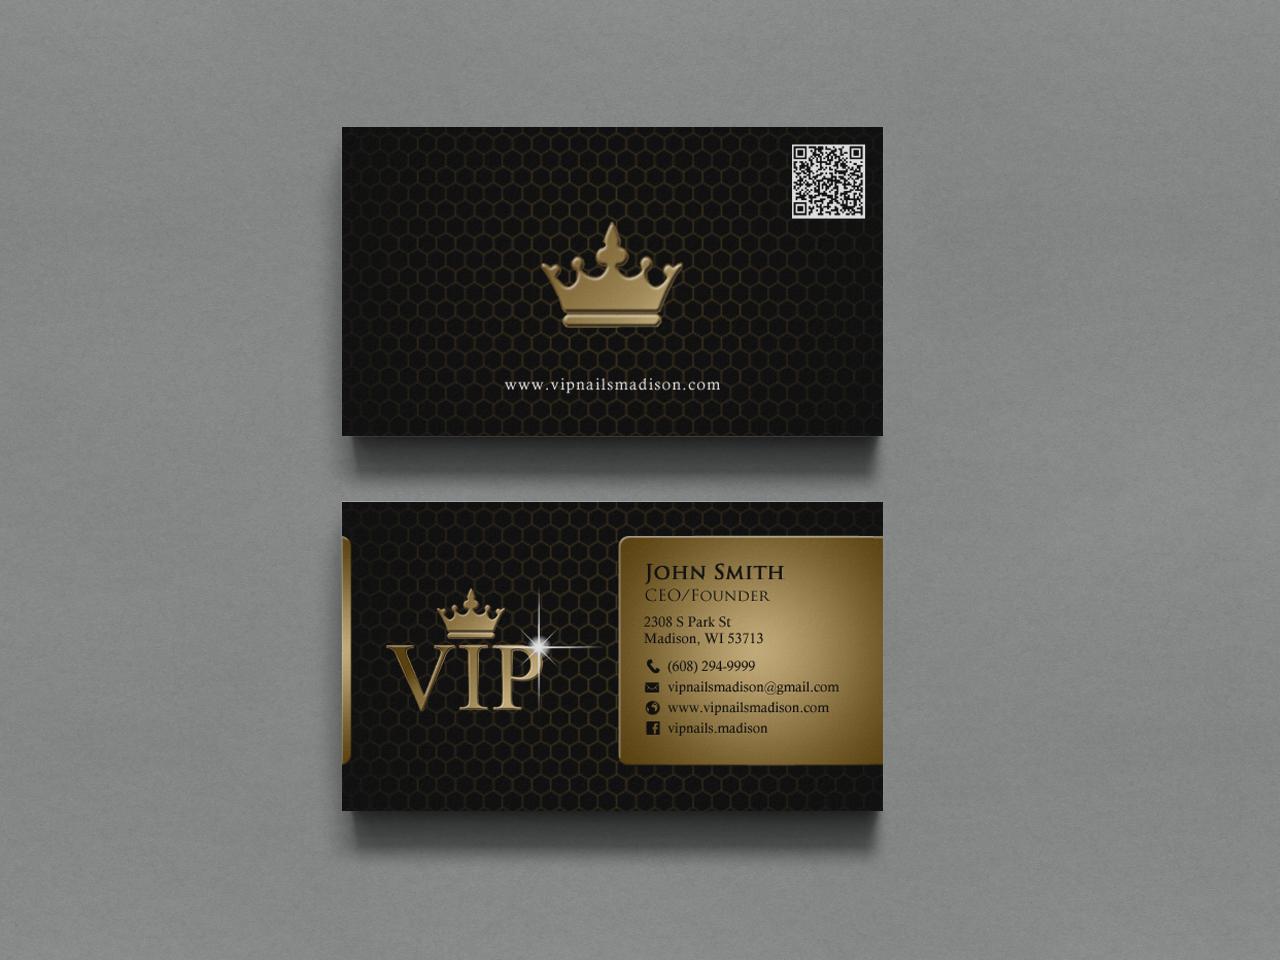 Elegant playful business business card design for vip nails spa business card design by chandrayaaneative for vip nails spa design 8506215 reheart Choice Image